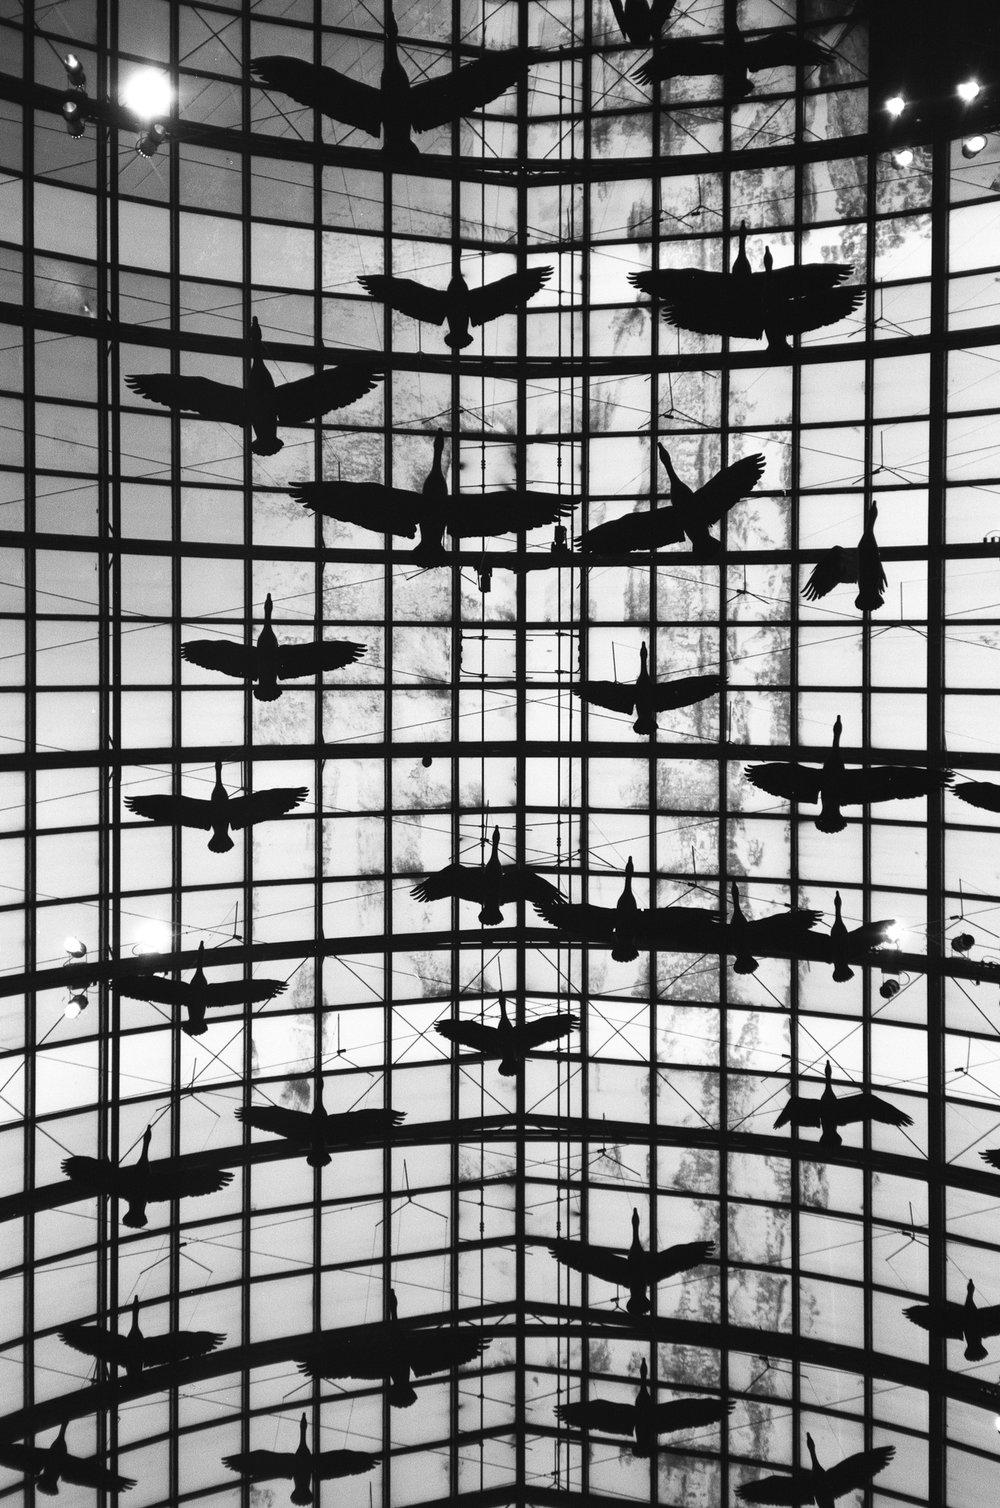 Untitled | Minolta AF-C |Ferrania P30 | A. Gammell